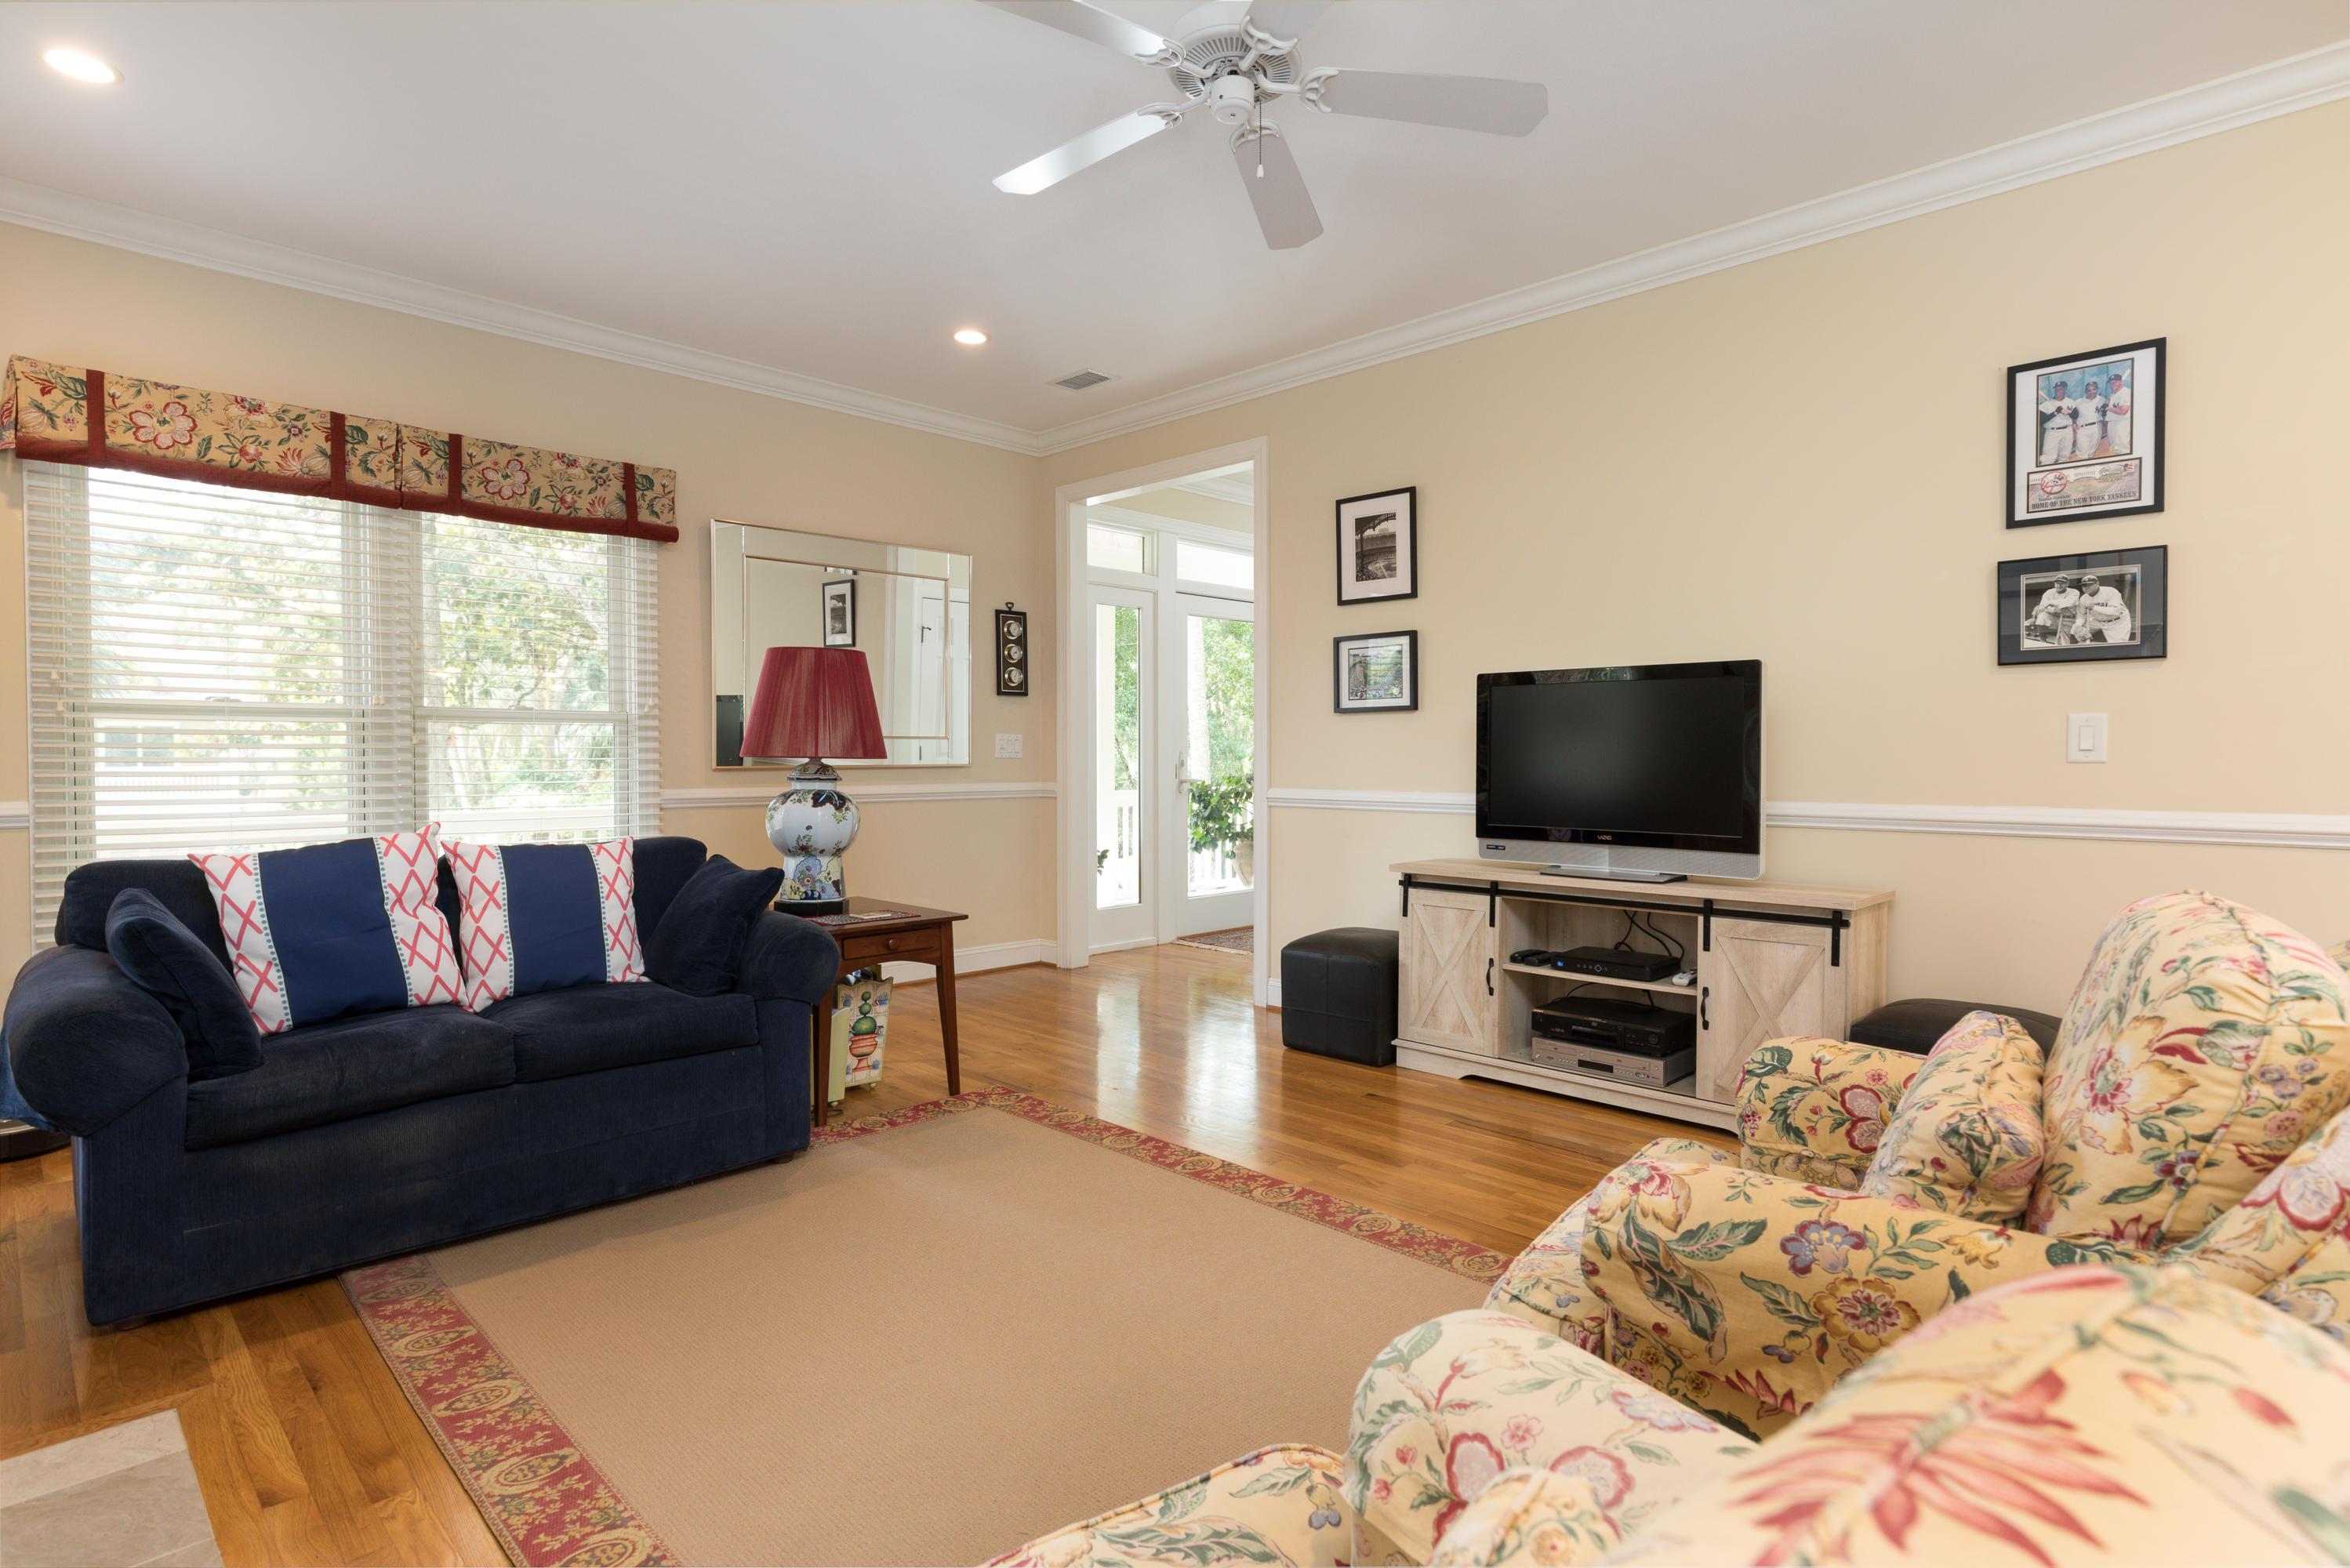 Seabrook Island Homes For Sale - 1014 Crooked Oaks, Seabrook Island, SC - 50